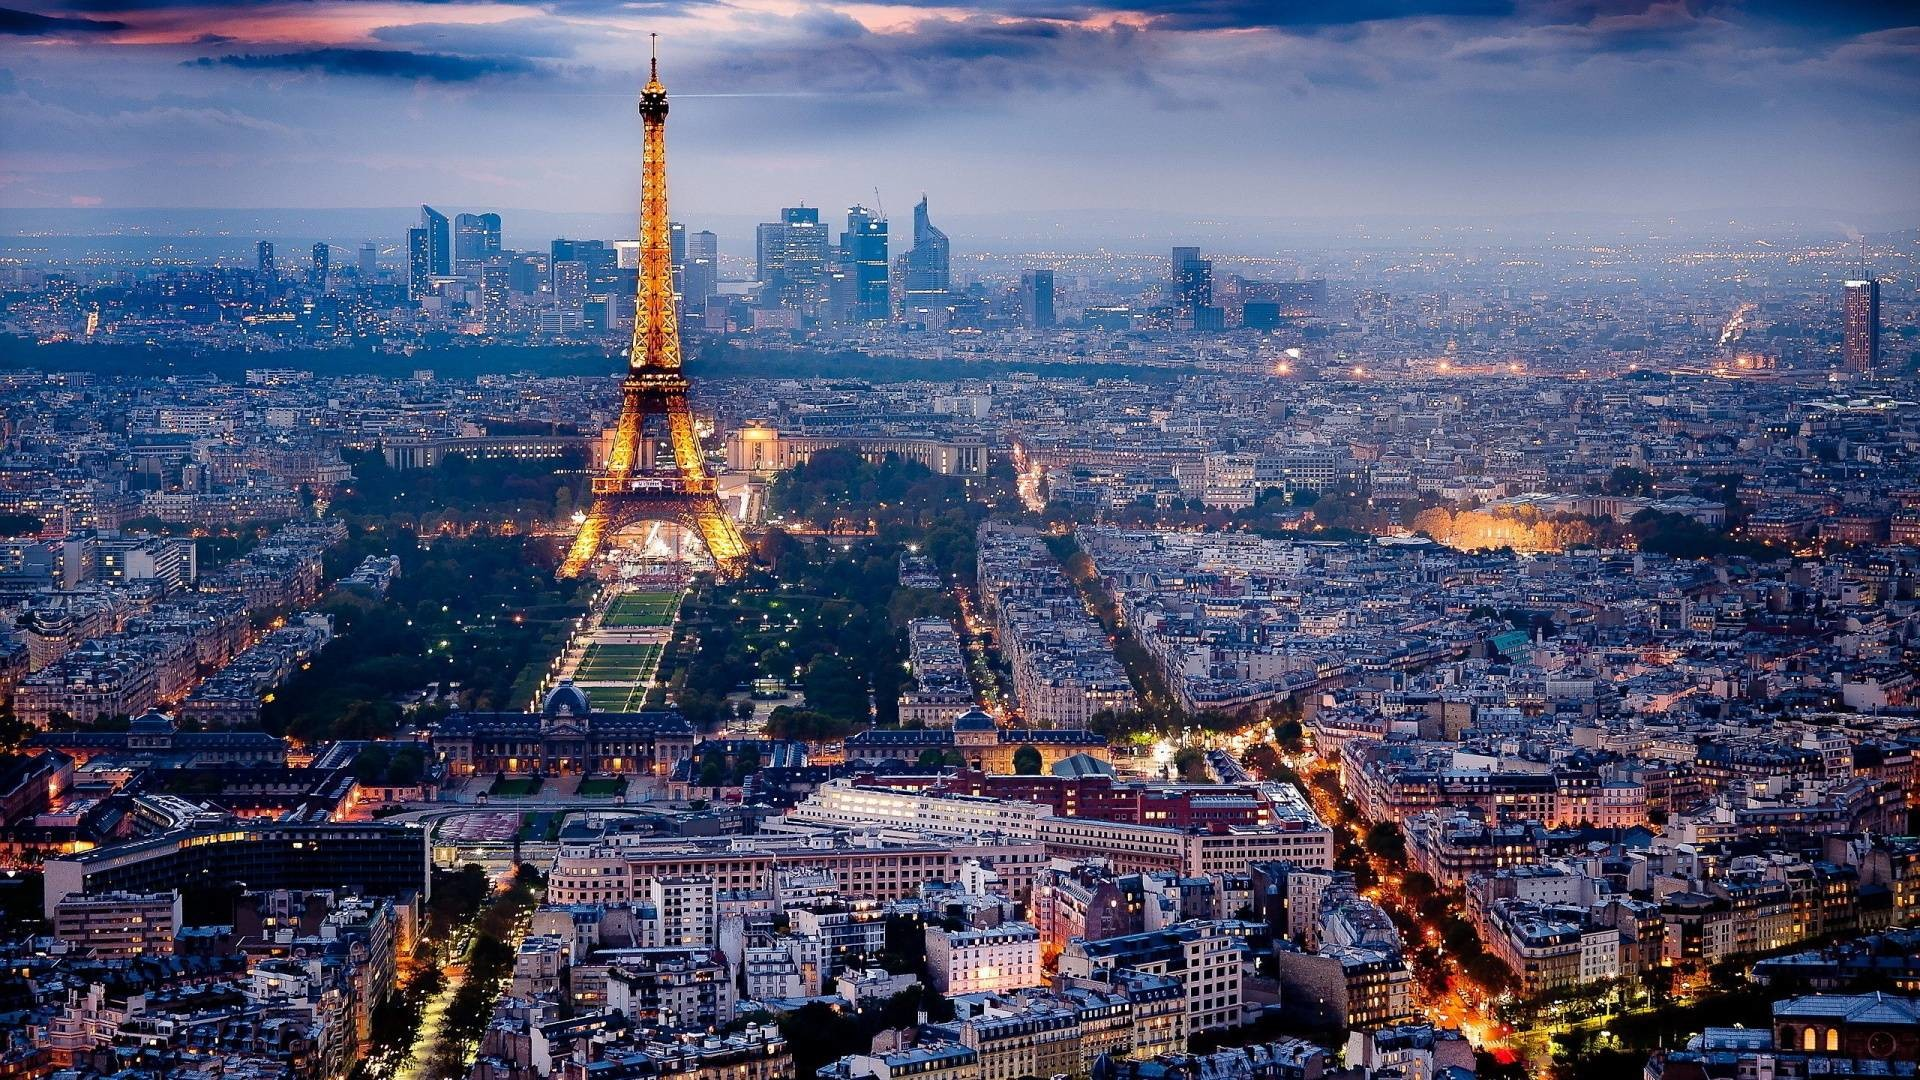 Paris City Of Love Quotes Wallpaper Desktop | SmaData.com